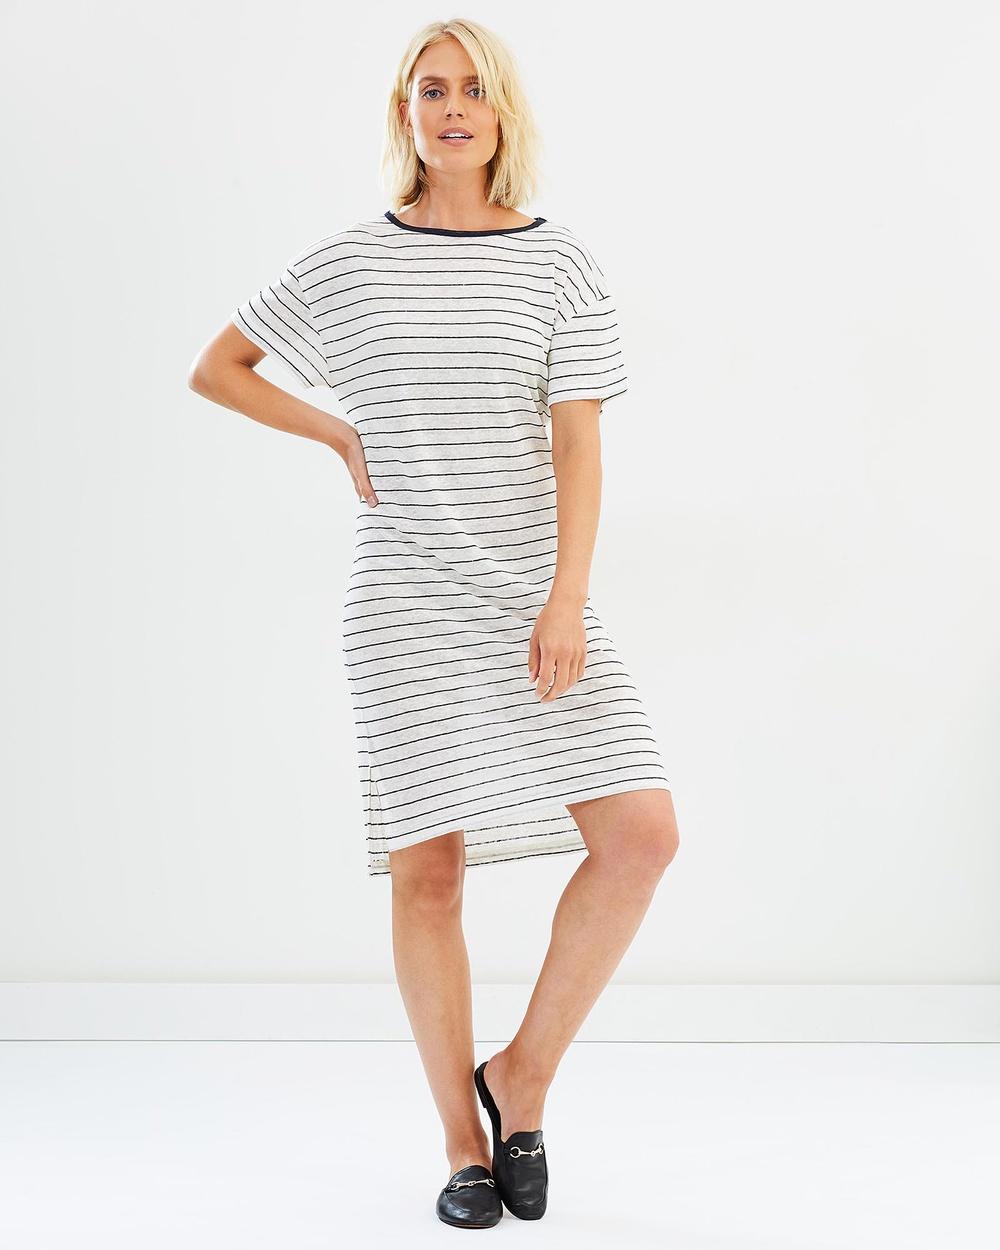 North Sails Oversized Short Sleeve Dress Dresses Combo 2 Oversized Short Sleeve Dress